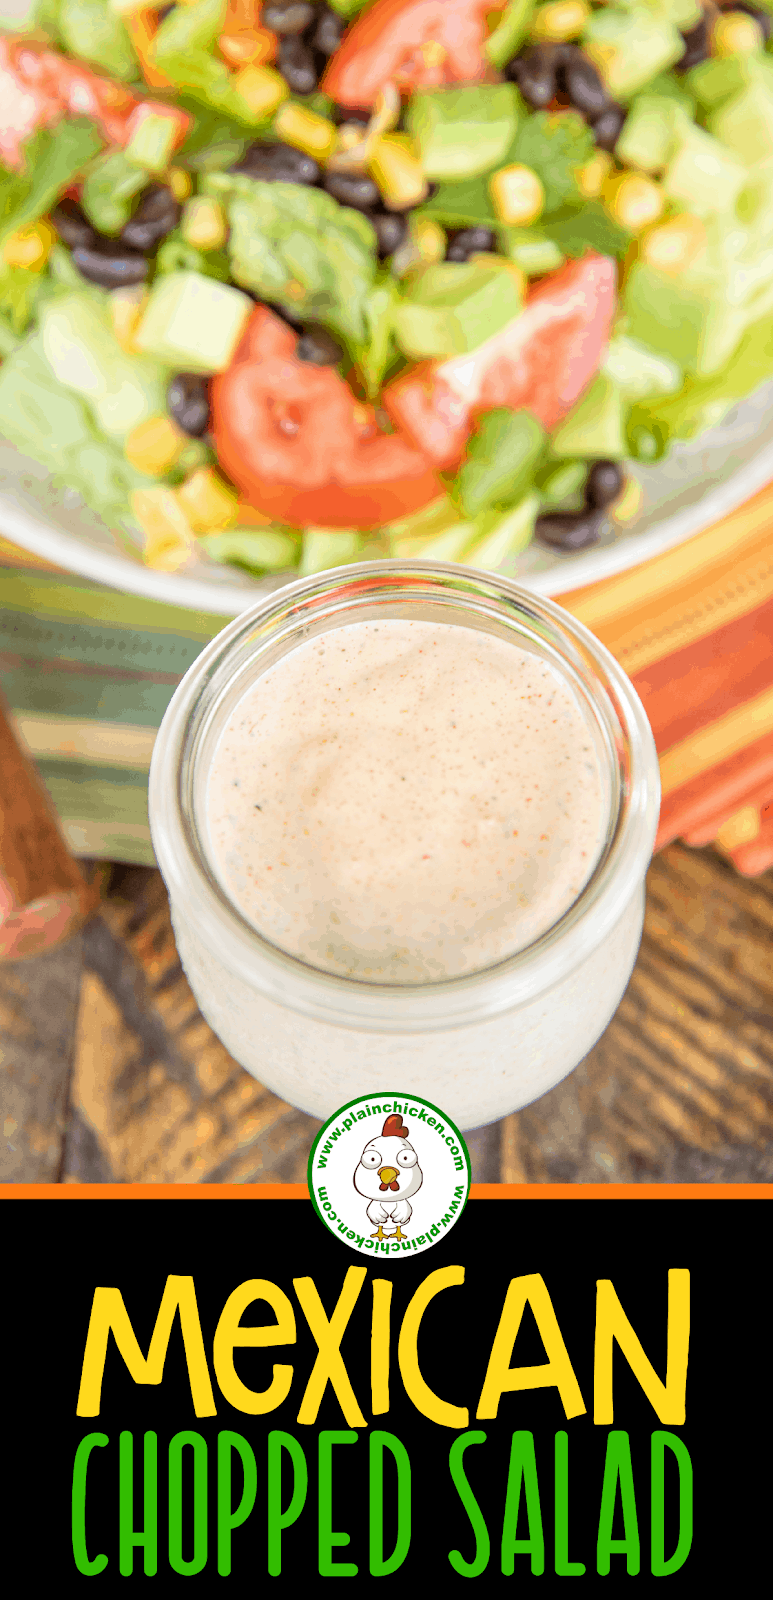 jar of homemade salad dressing